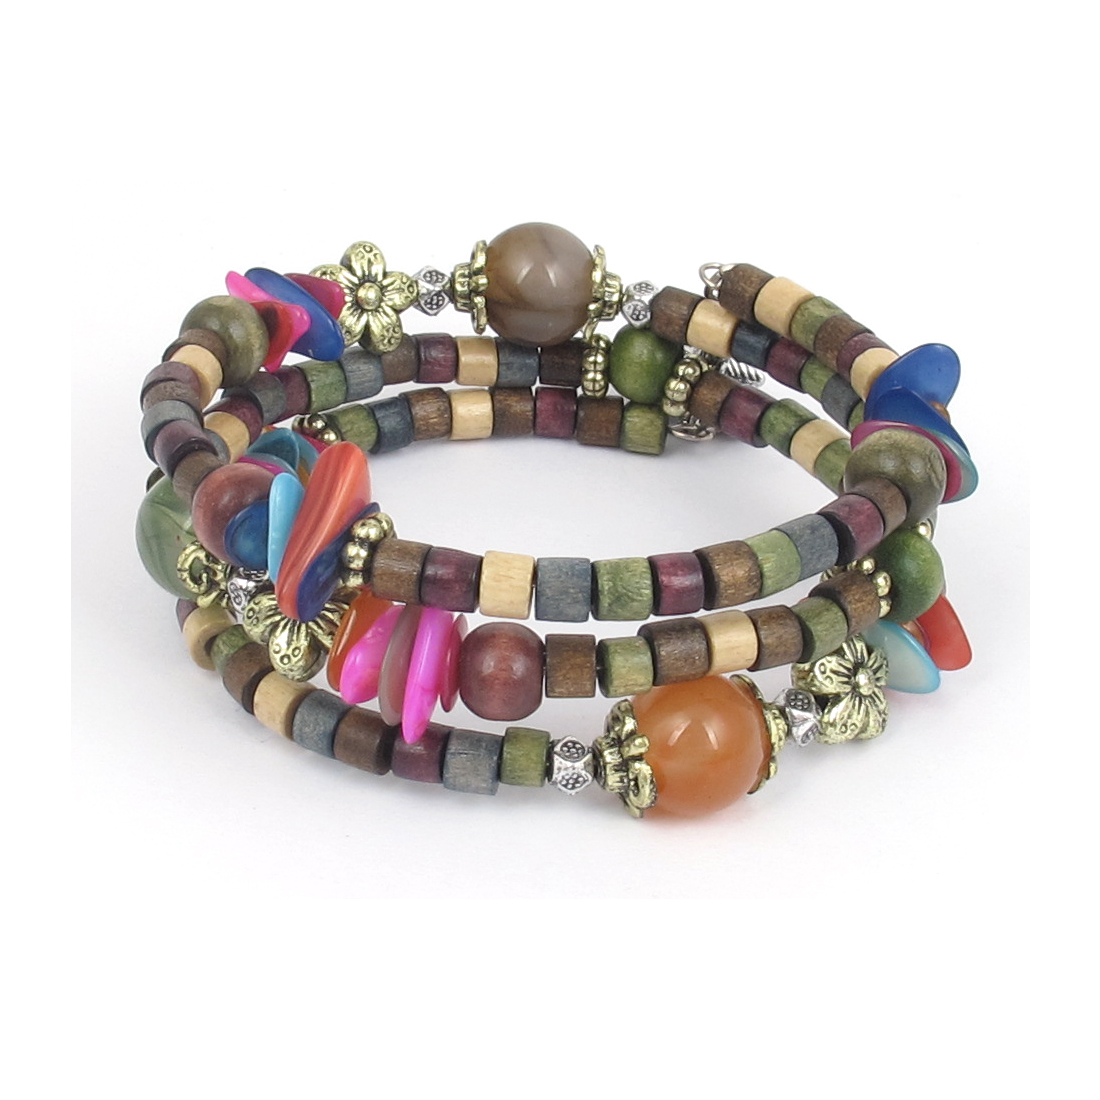 Women Handmade National Flavor Wooden Cylinder Beads Flower Decor 3-layer Bangle Bracelet Multicolor